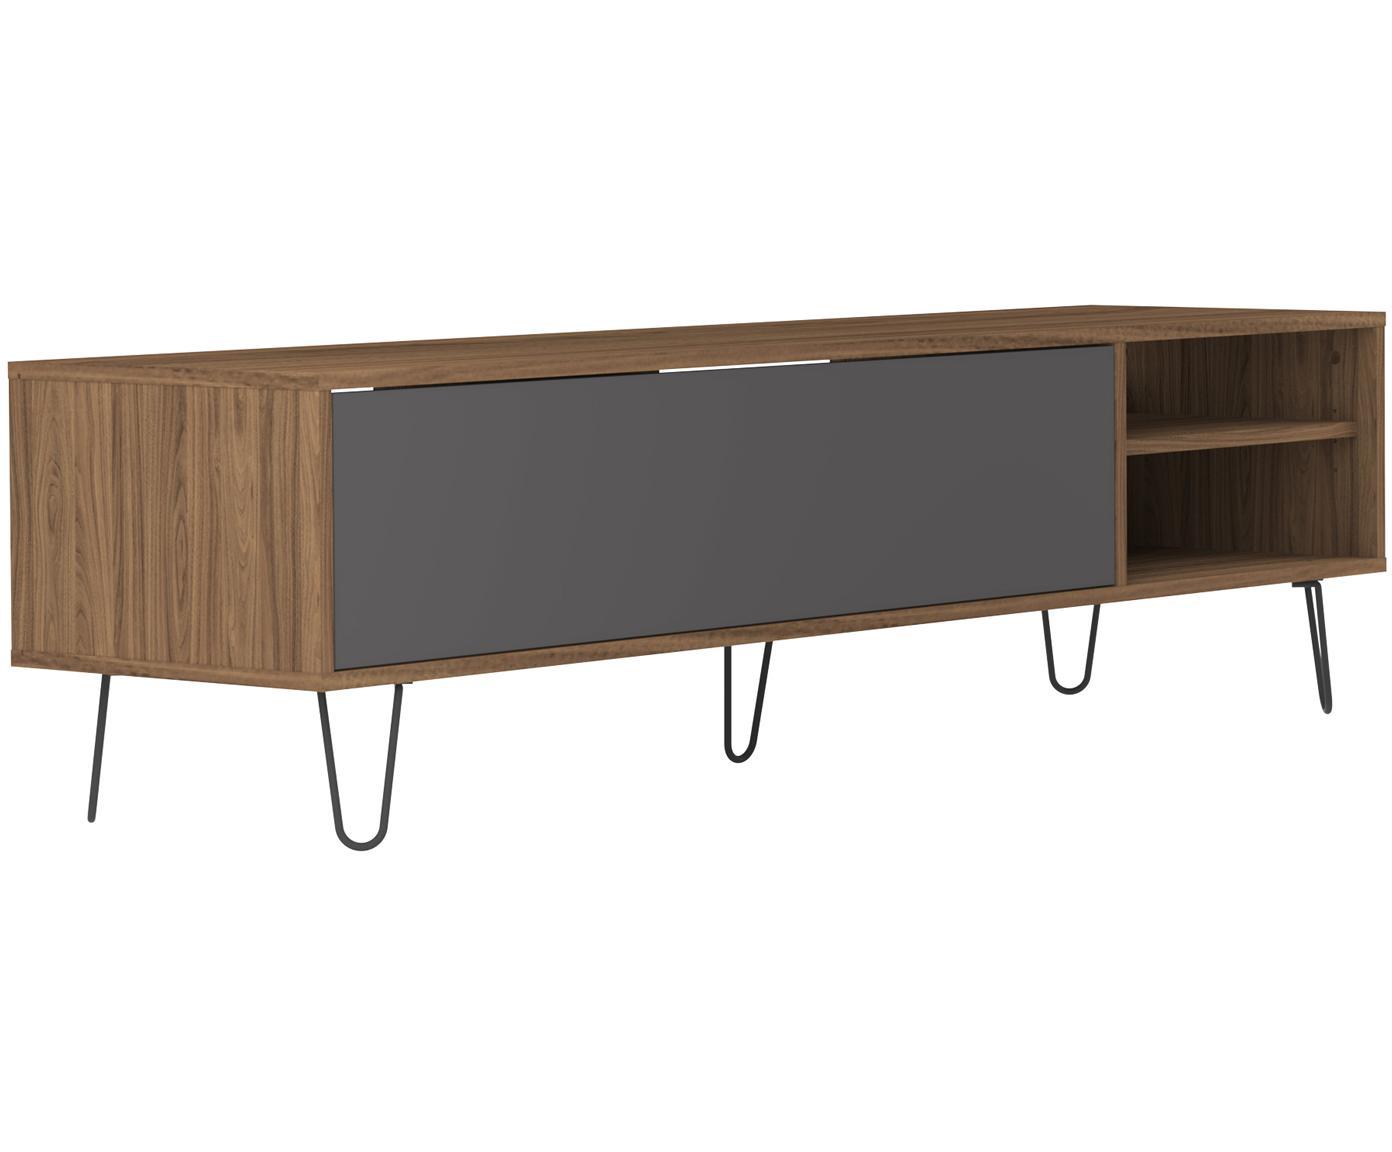 TV-Lowboard Aero mit Klapptür, Korpus: Spanplatte, melaminbeschi, Füße: Metall, lackiert, Walnussholz, Grau, 165 x 44 cm